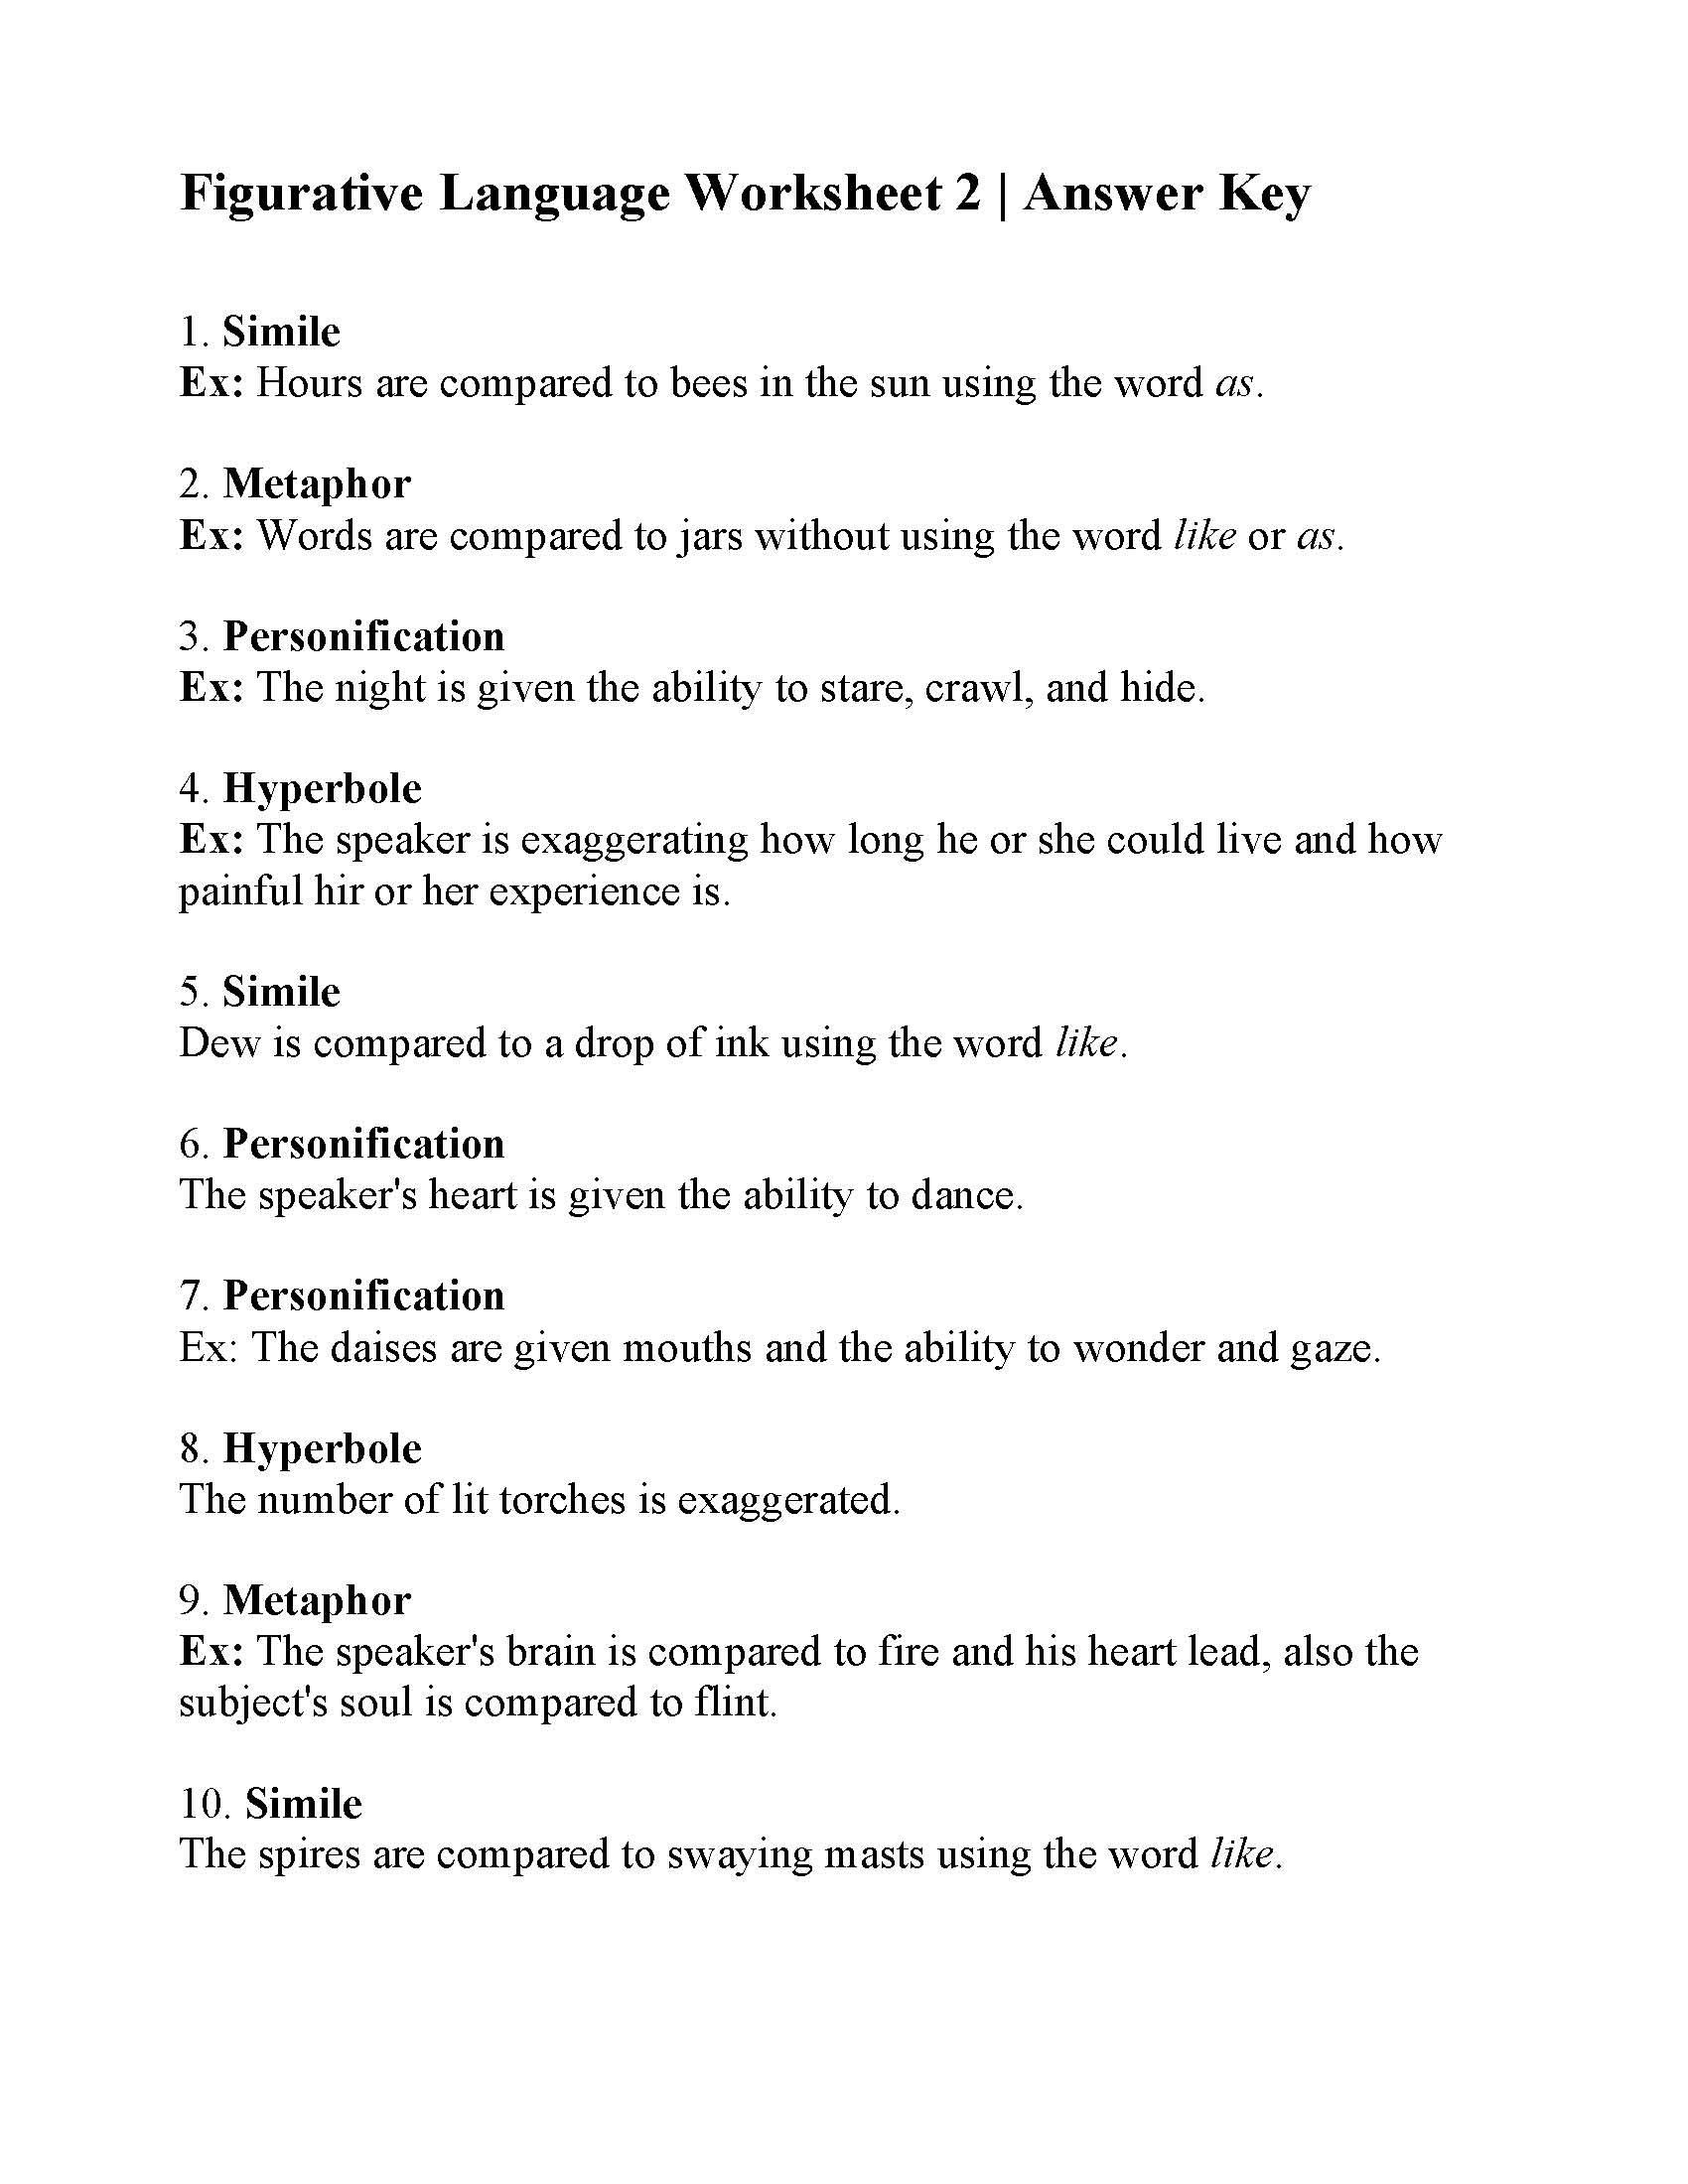 Figurative Language Worksheet 2 Answers | db-excel.com